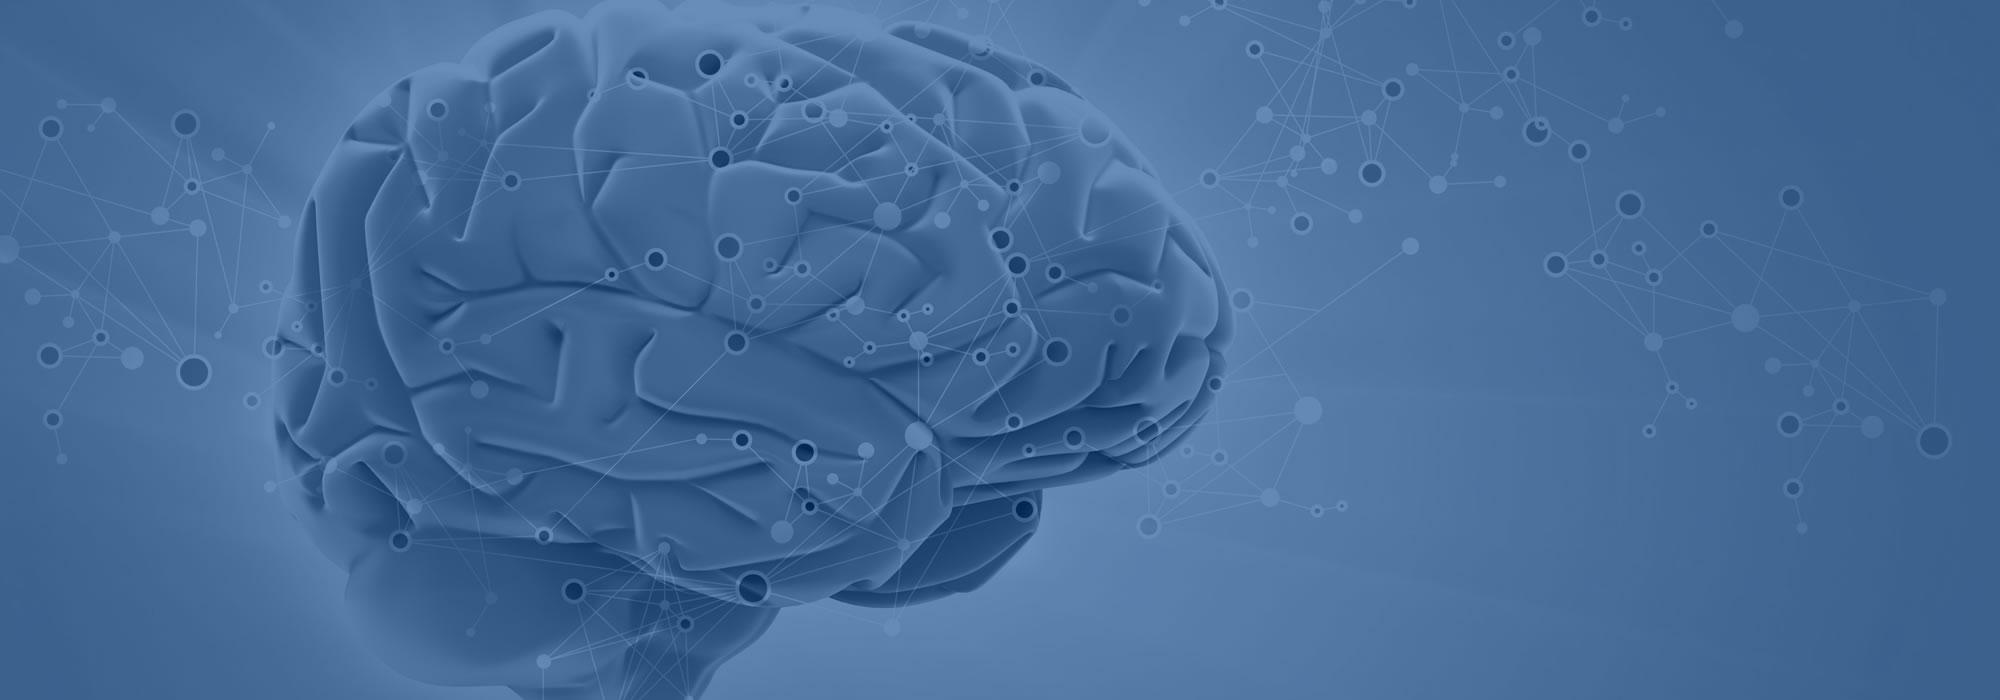 cerveau700bluedarker2